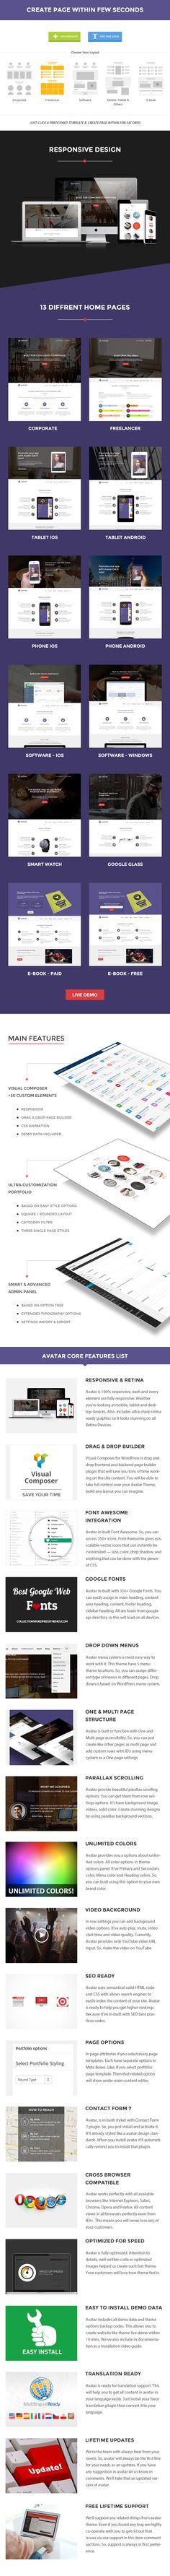 Avatar – One Page Parallax Theme